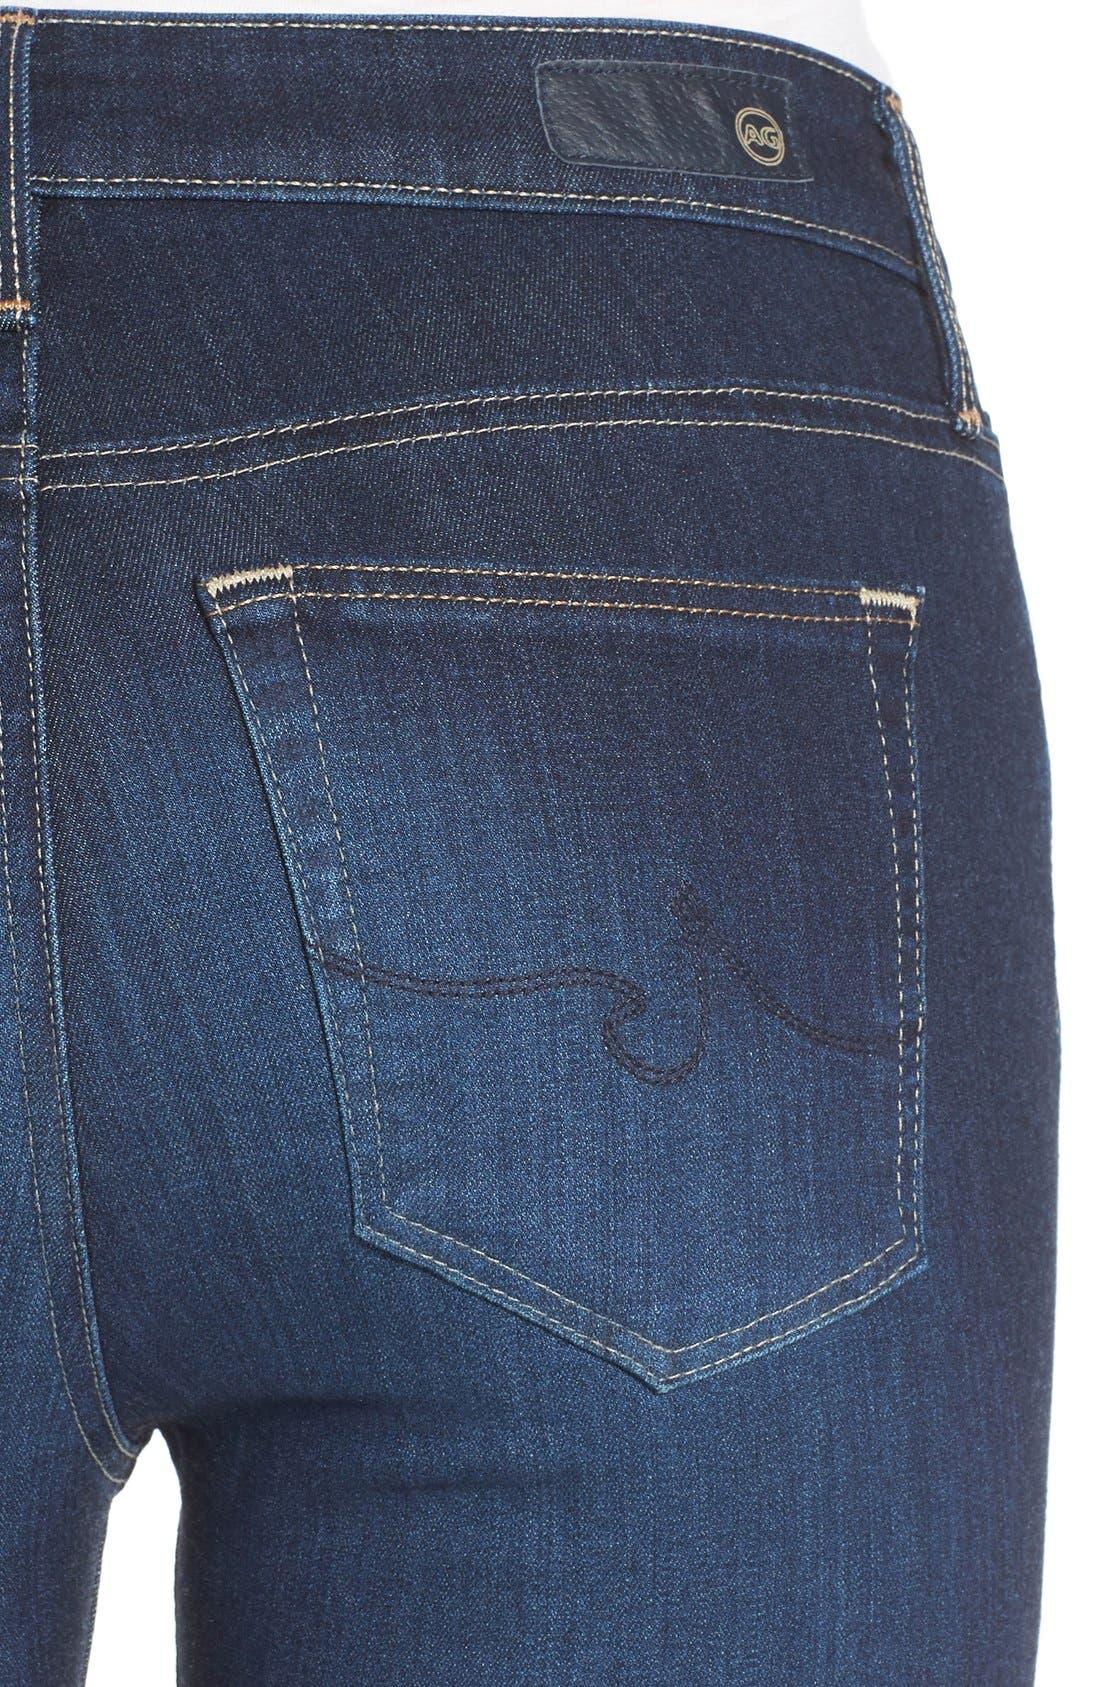 Alternate Image 4  - AG 'The Farrah' High Rise Crop Skinny Jeans